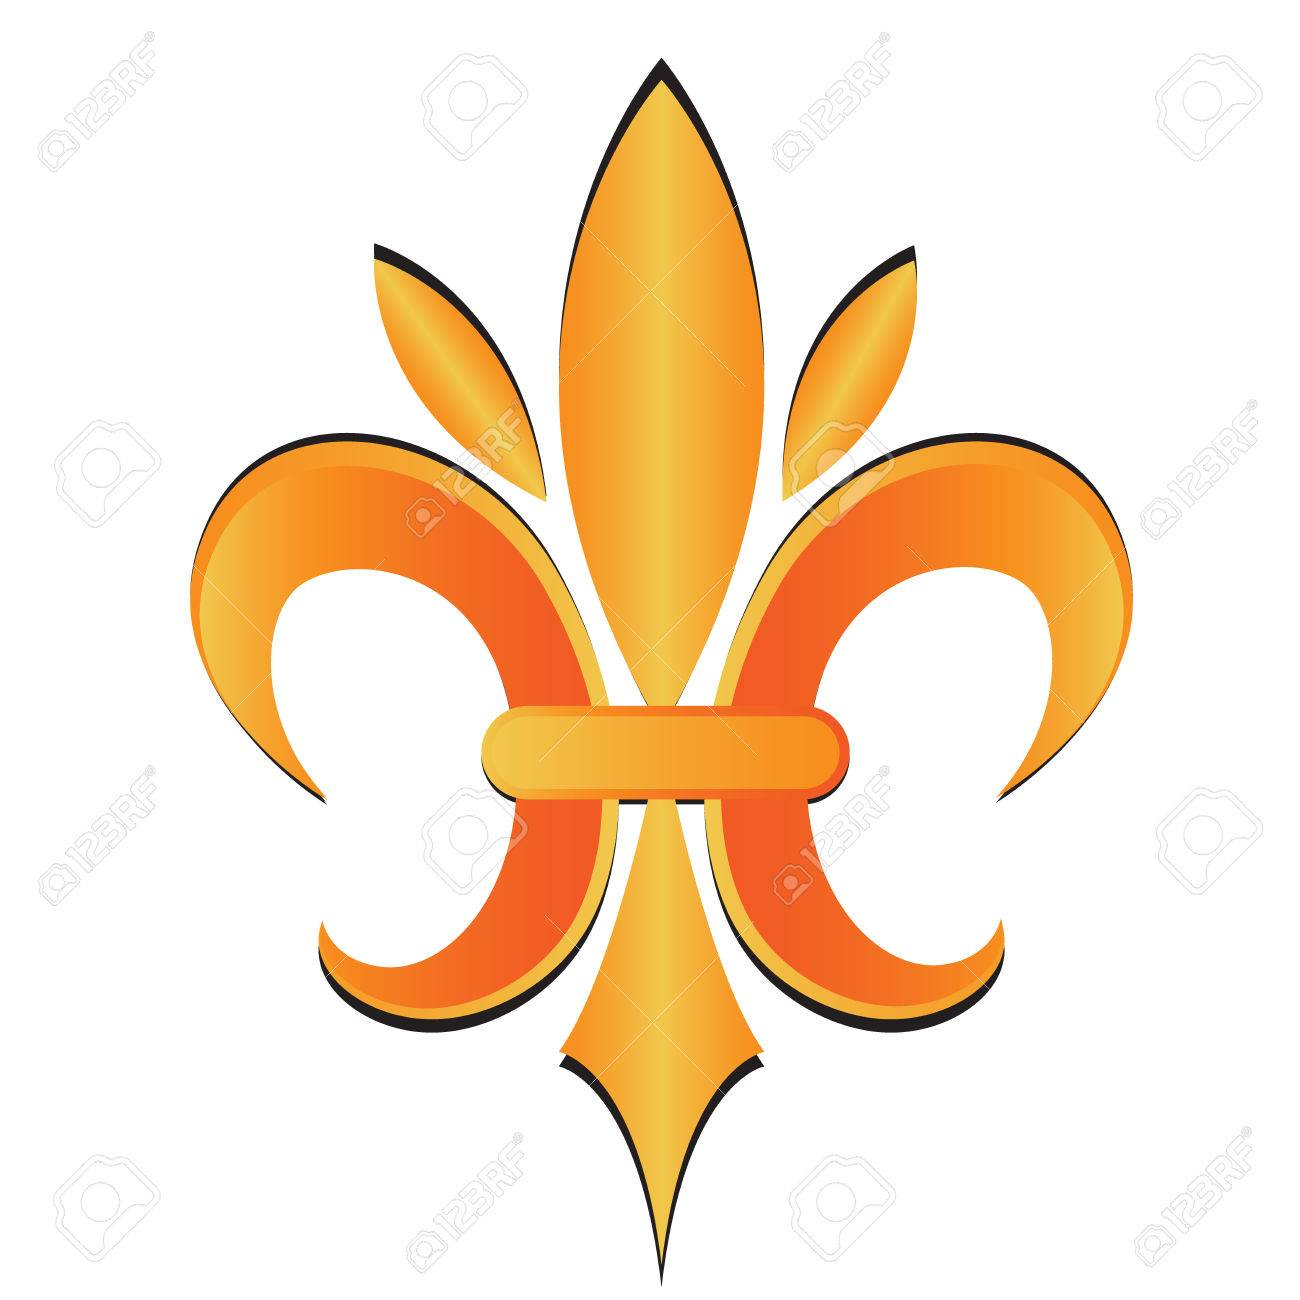 fleur de lis symbol flower logo icon vector image template royalty